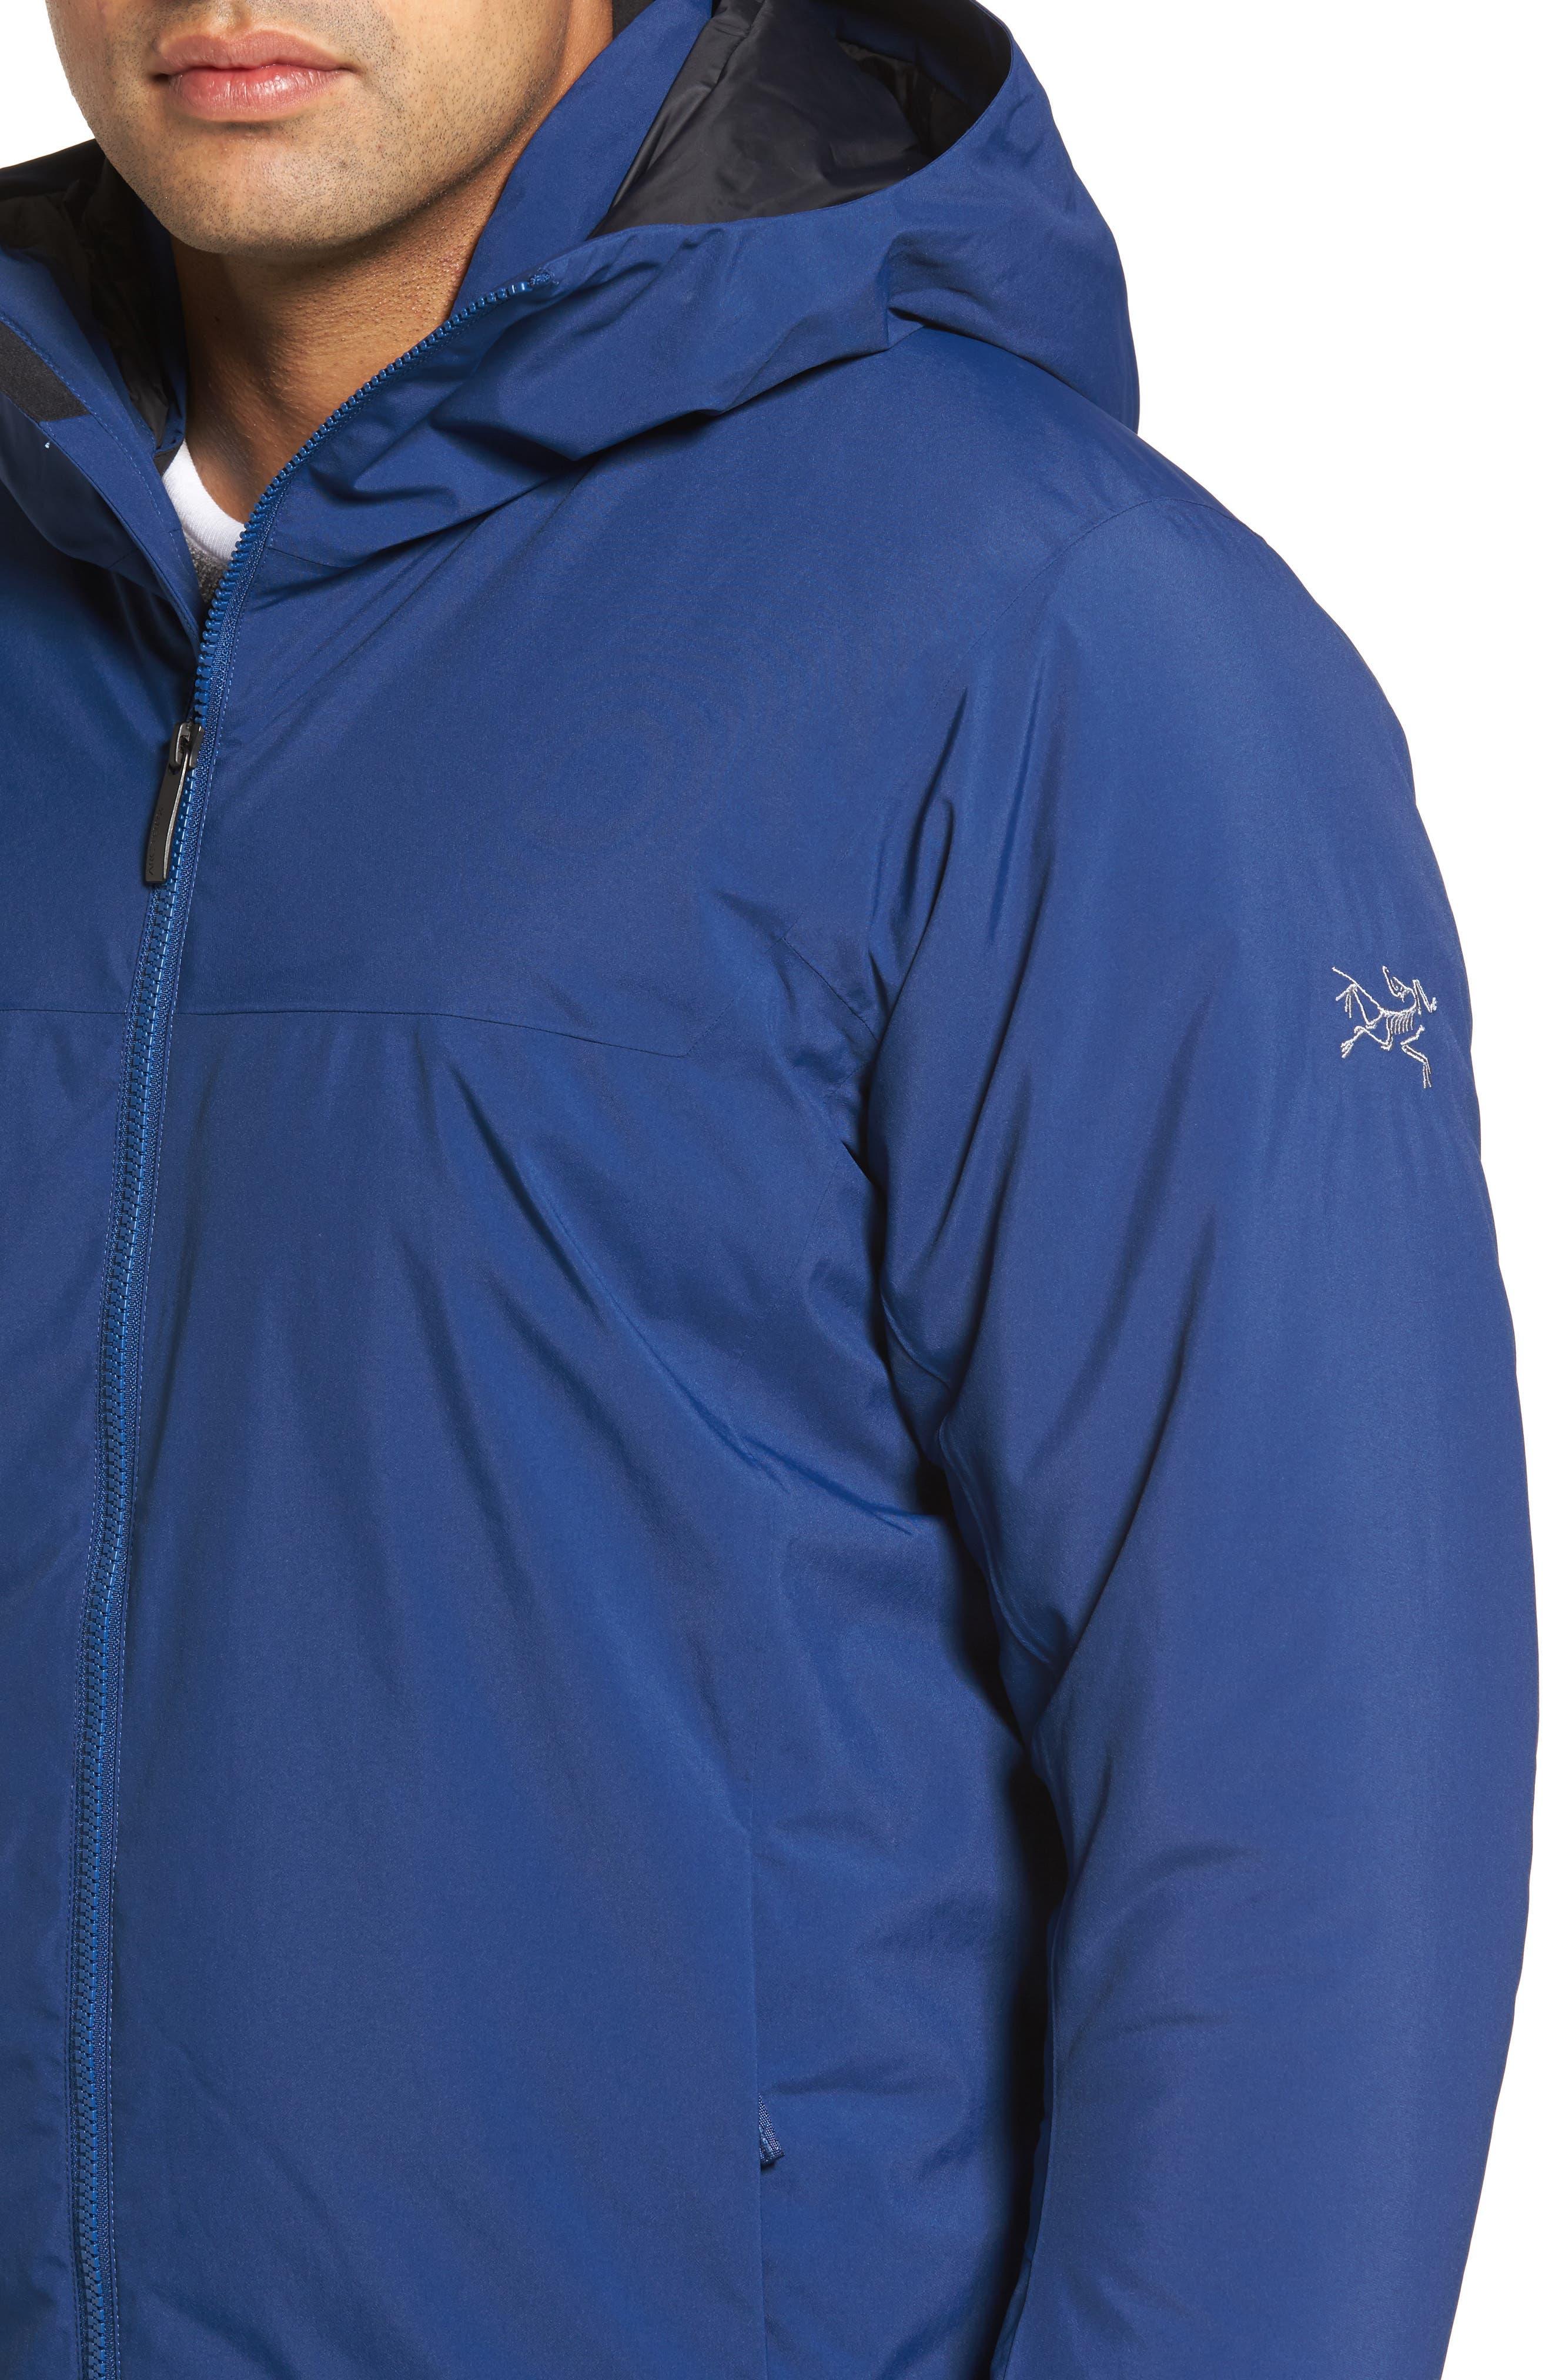 'Koda' Hooded Waterproof Shell Jacket,                             Alternate thumbnail 4, color,                             400